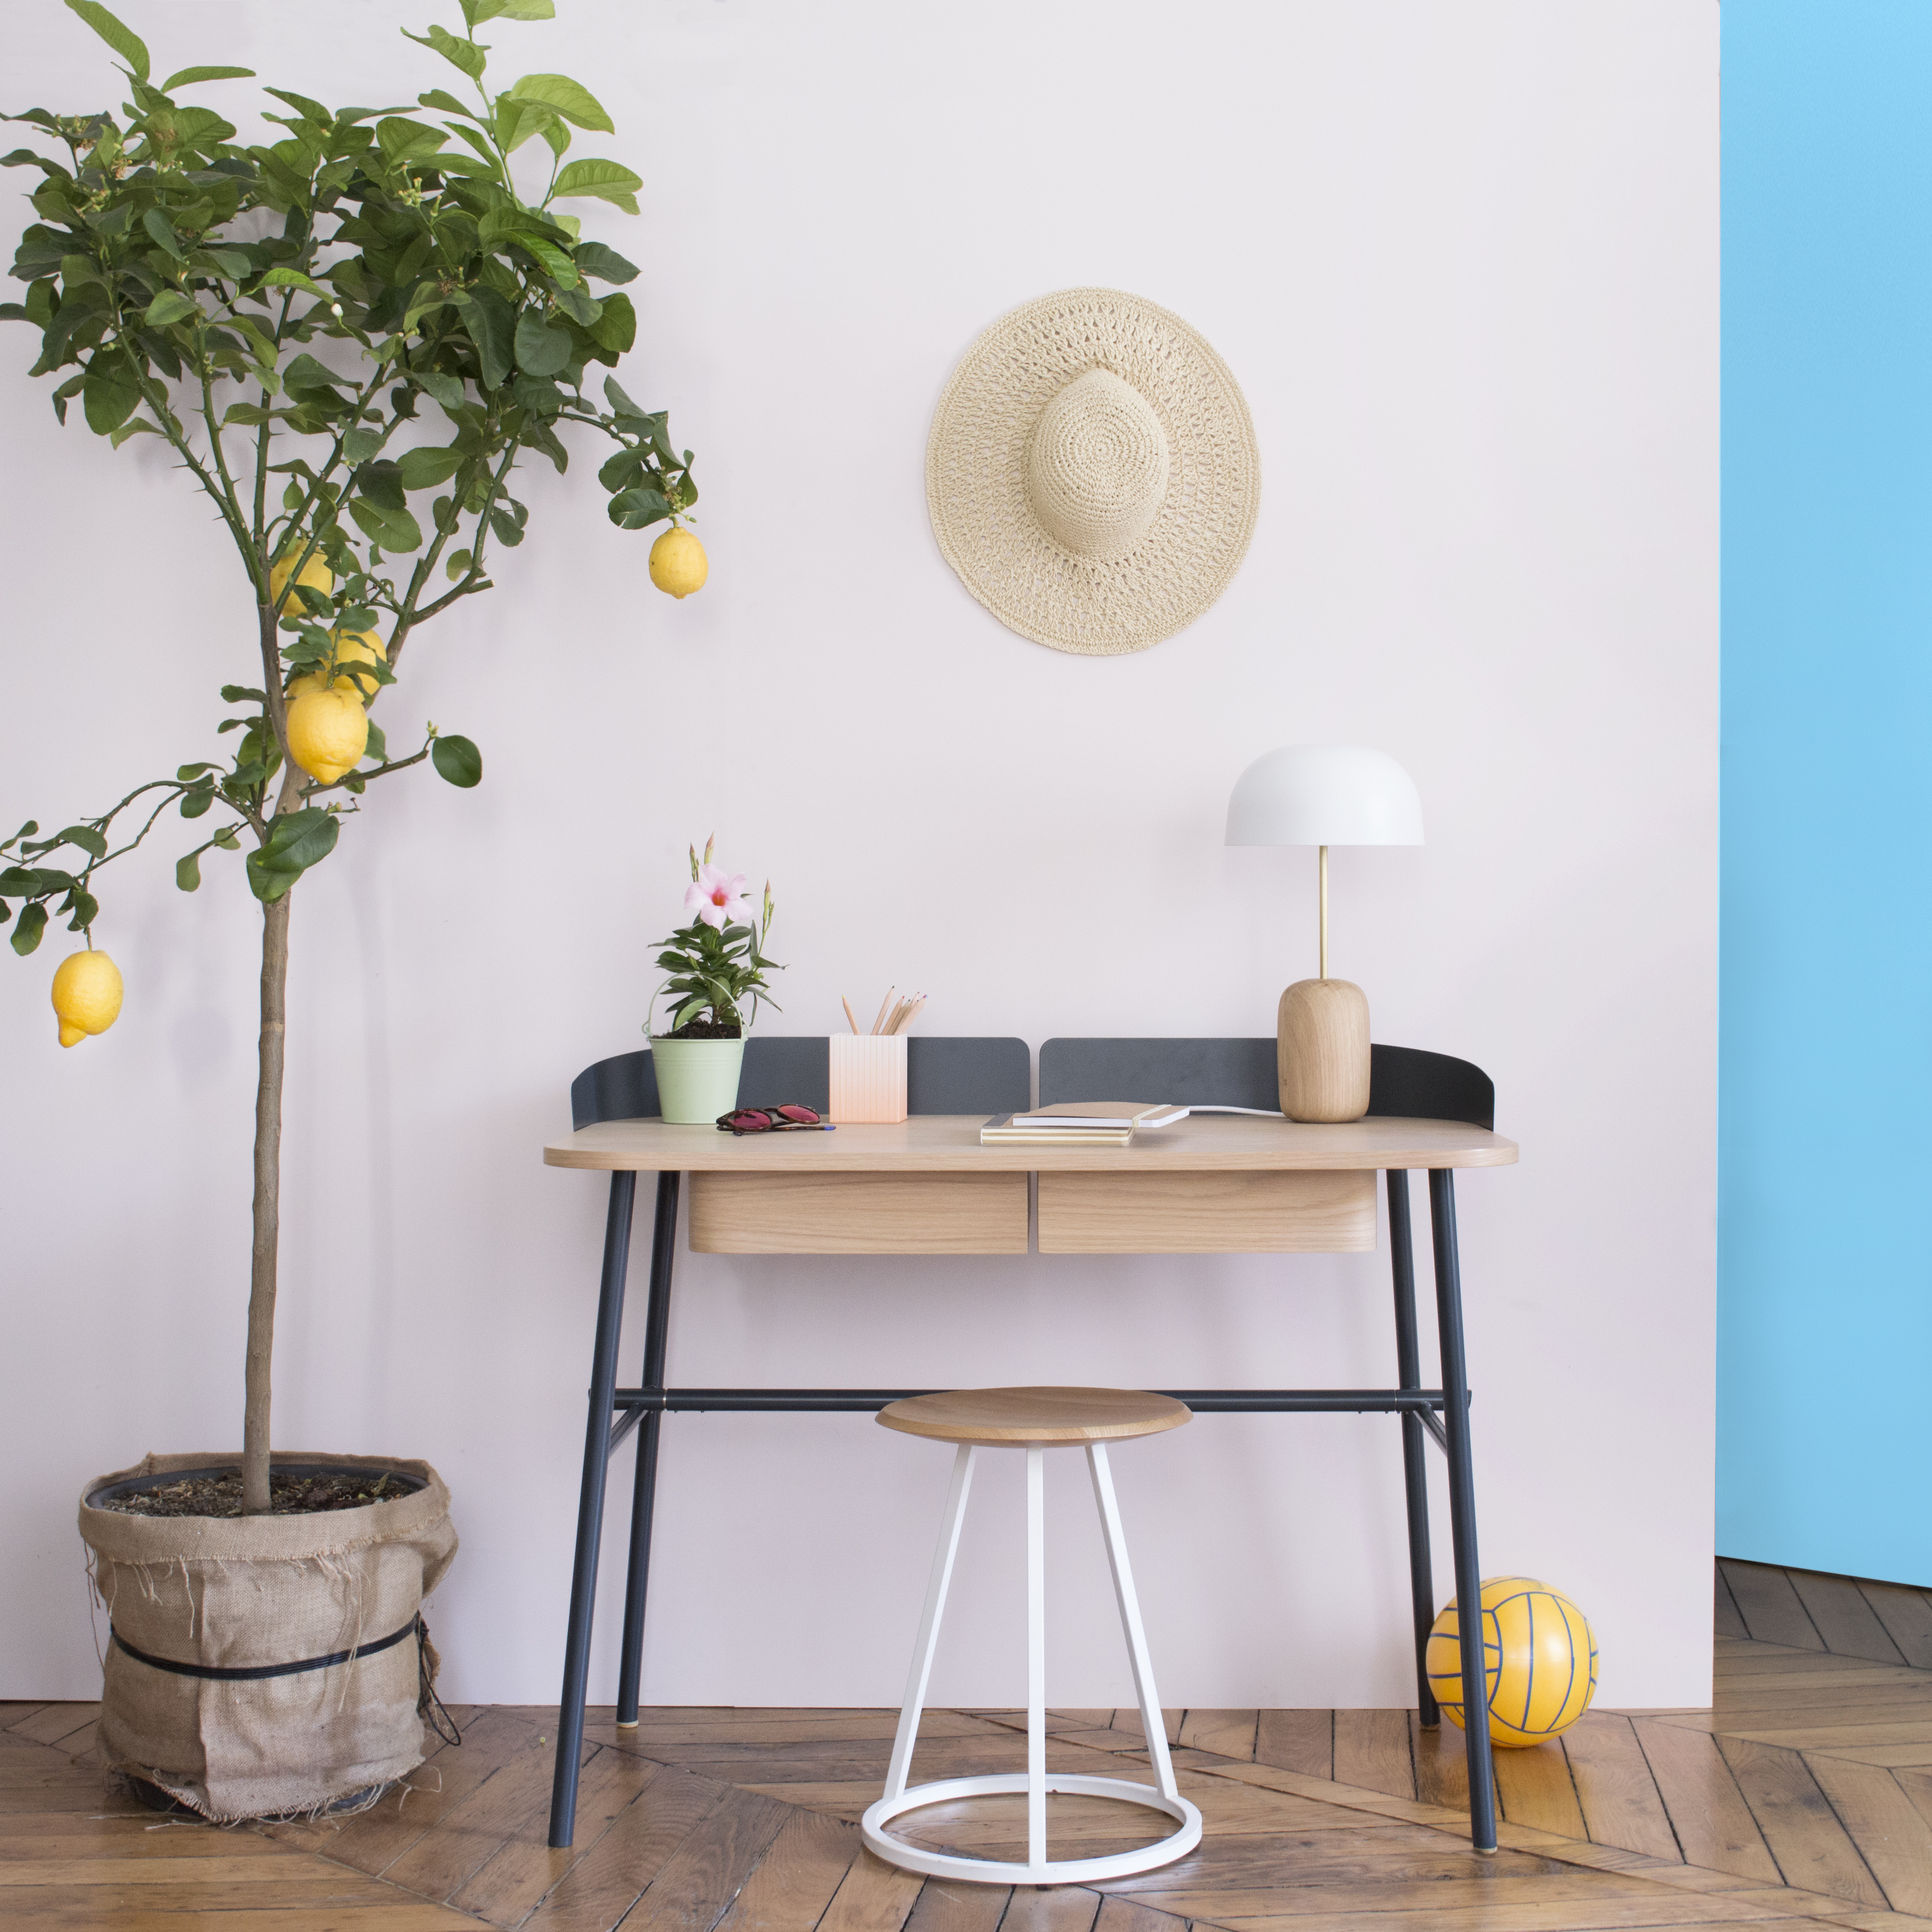 Atmosfer estival la interior casa ecodesign for Design eco casa verde